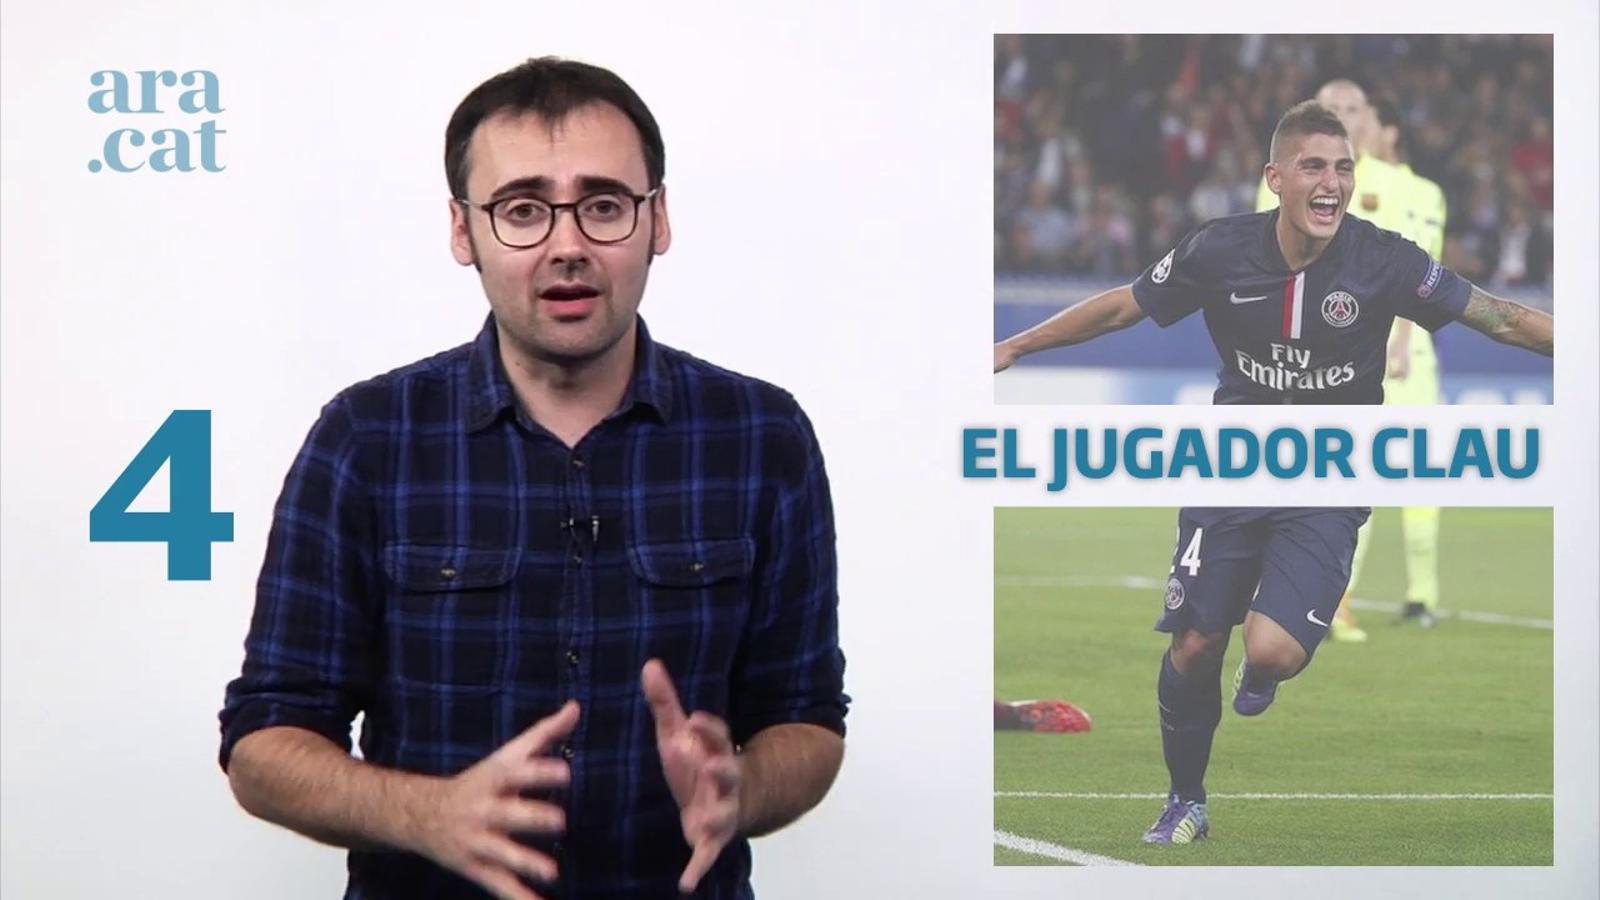 EL PSG, rival del Barça, en 5 claus